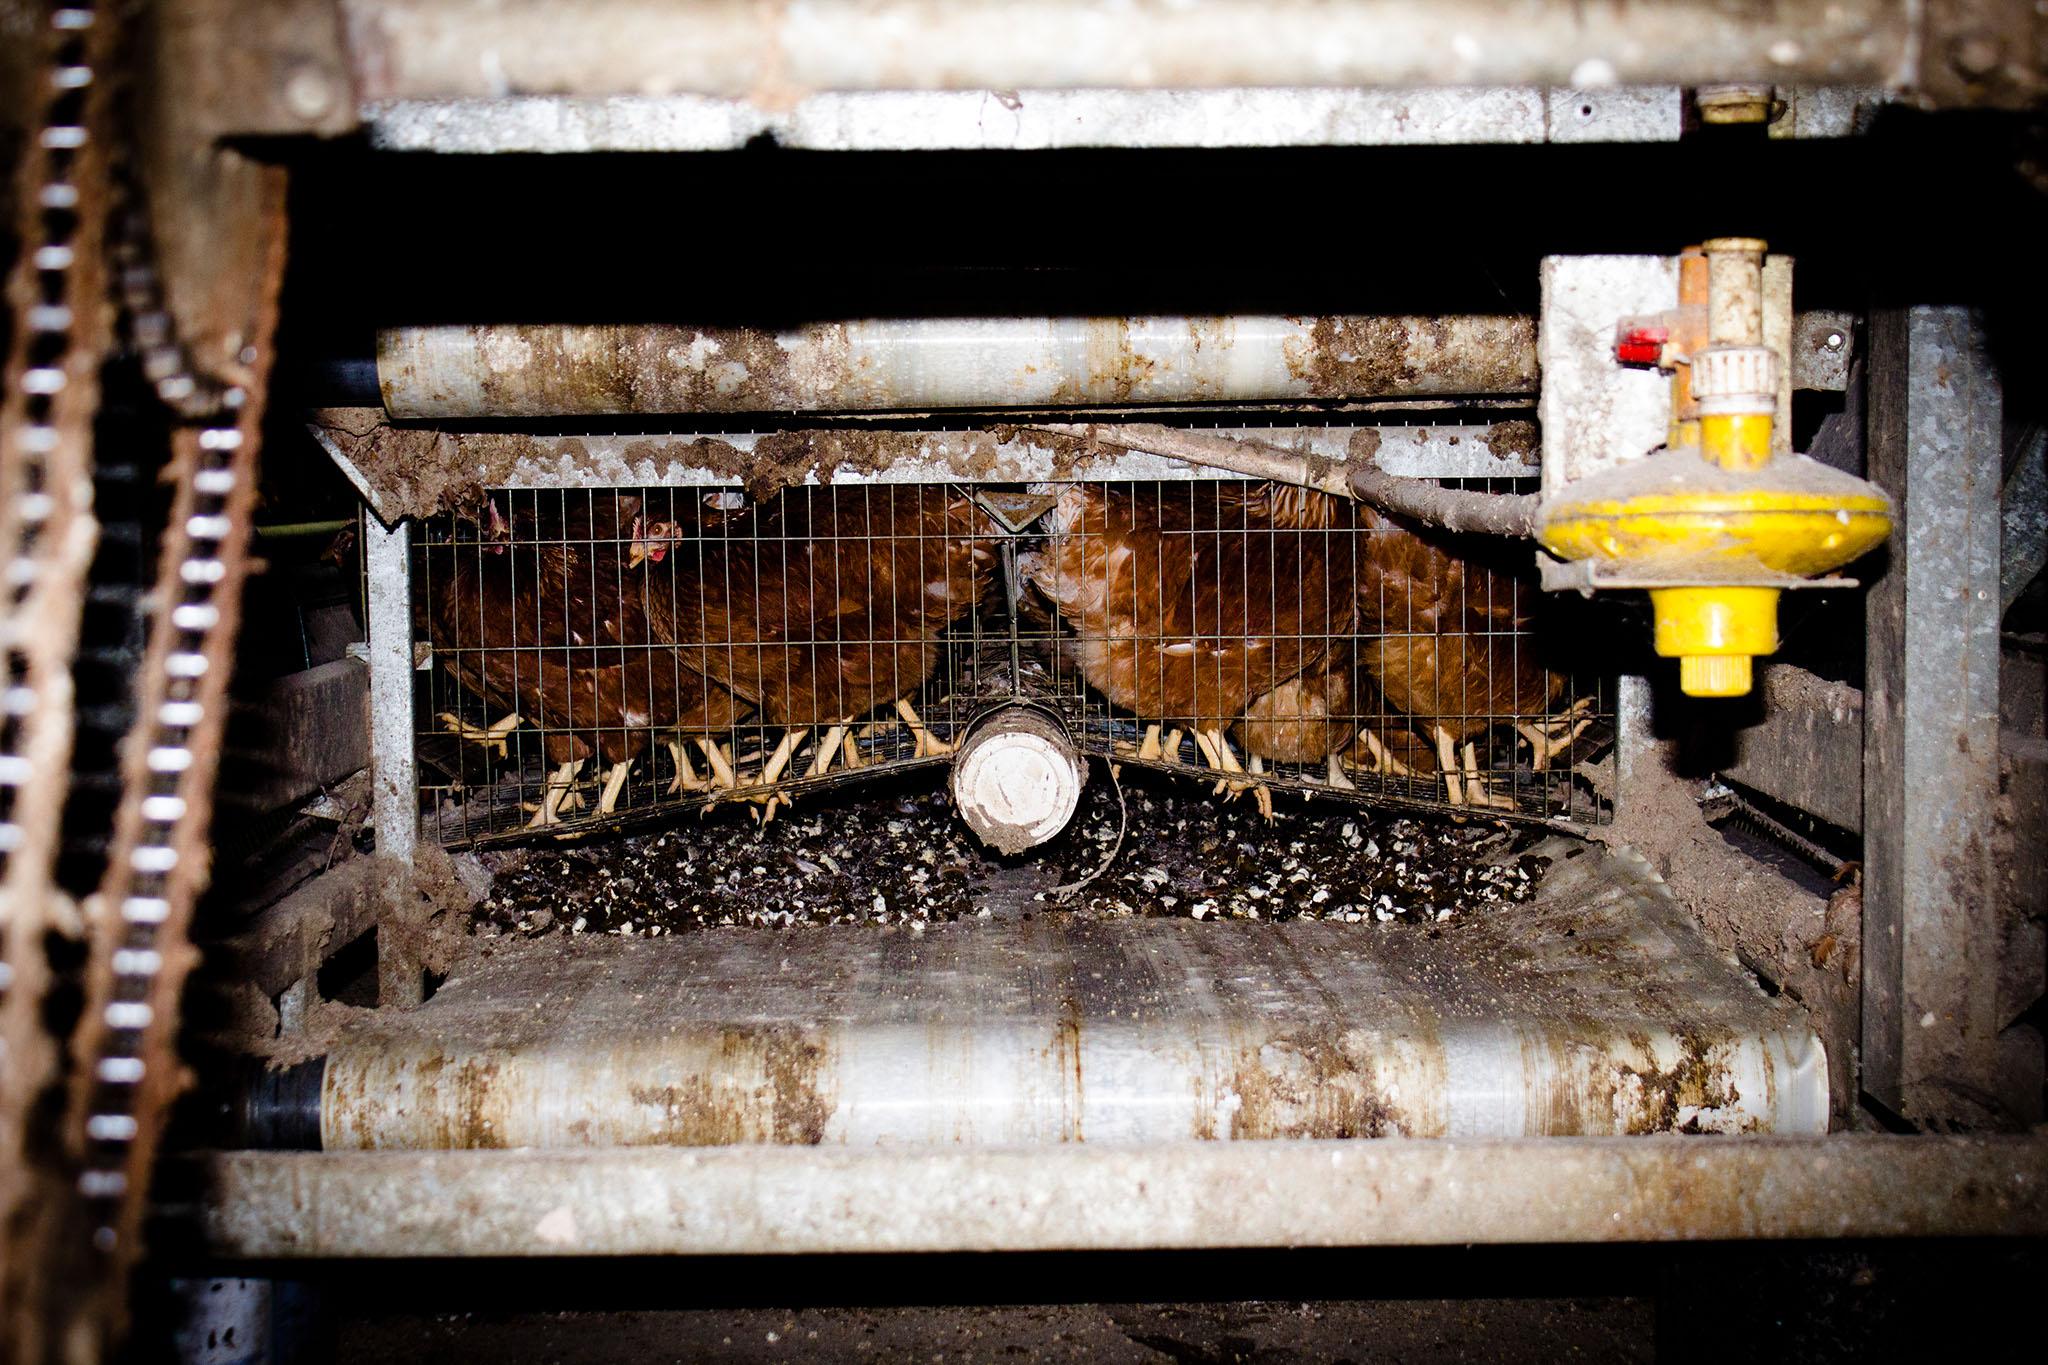 007-TW-FactoryFarming-130530.jpg